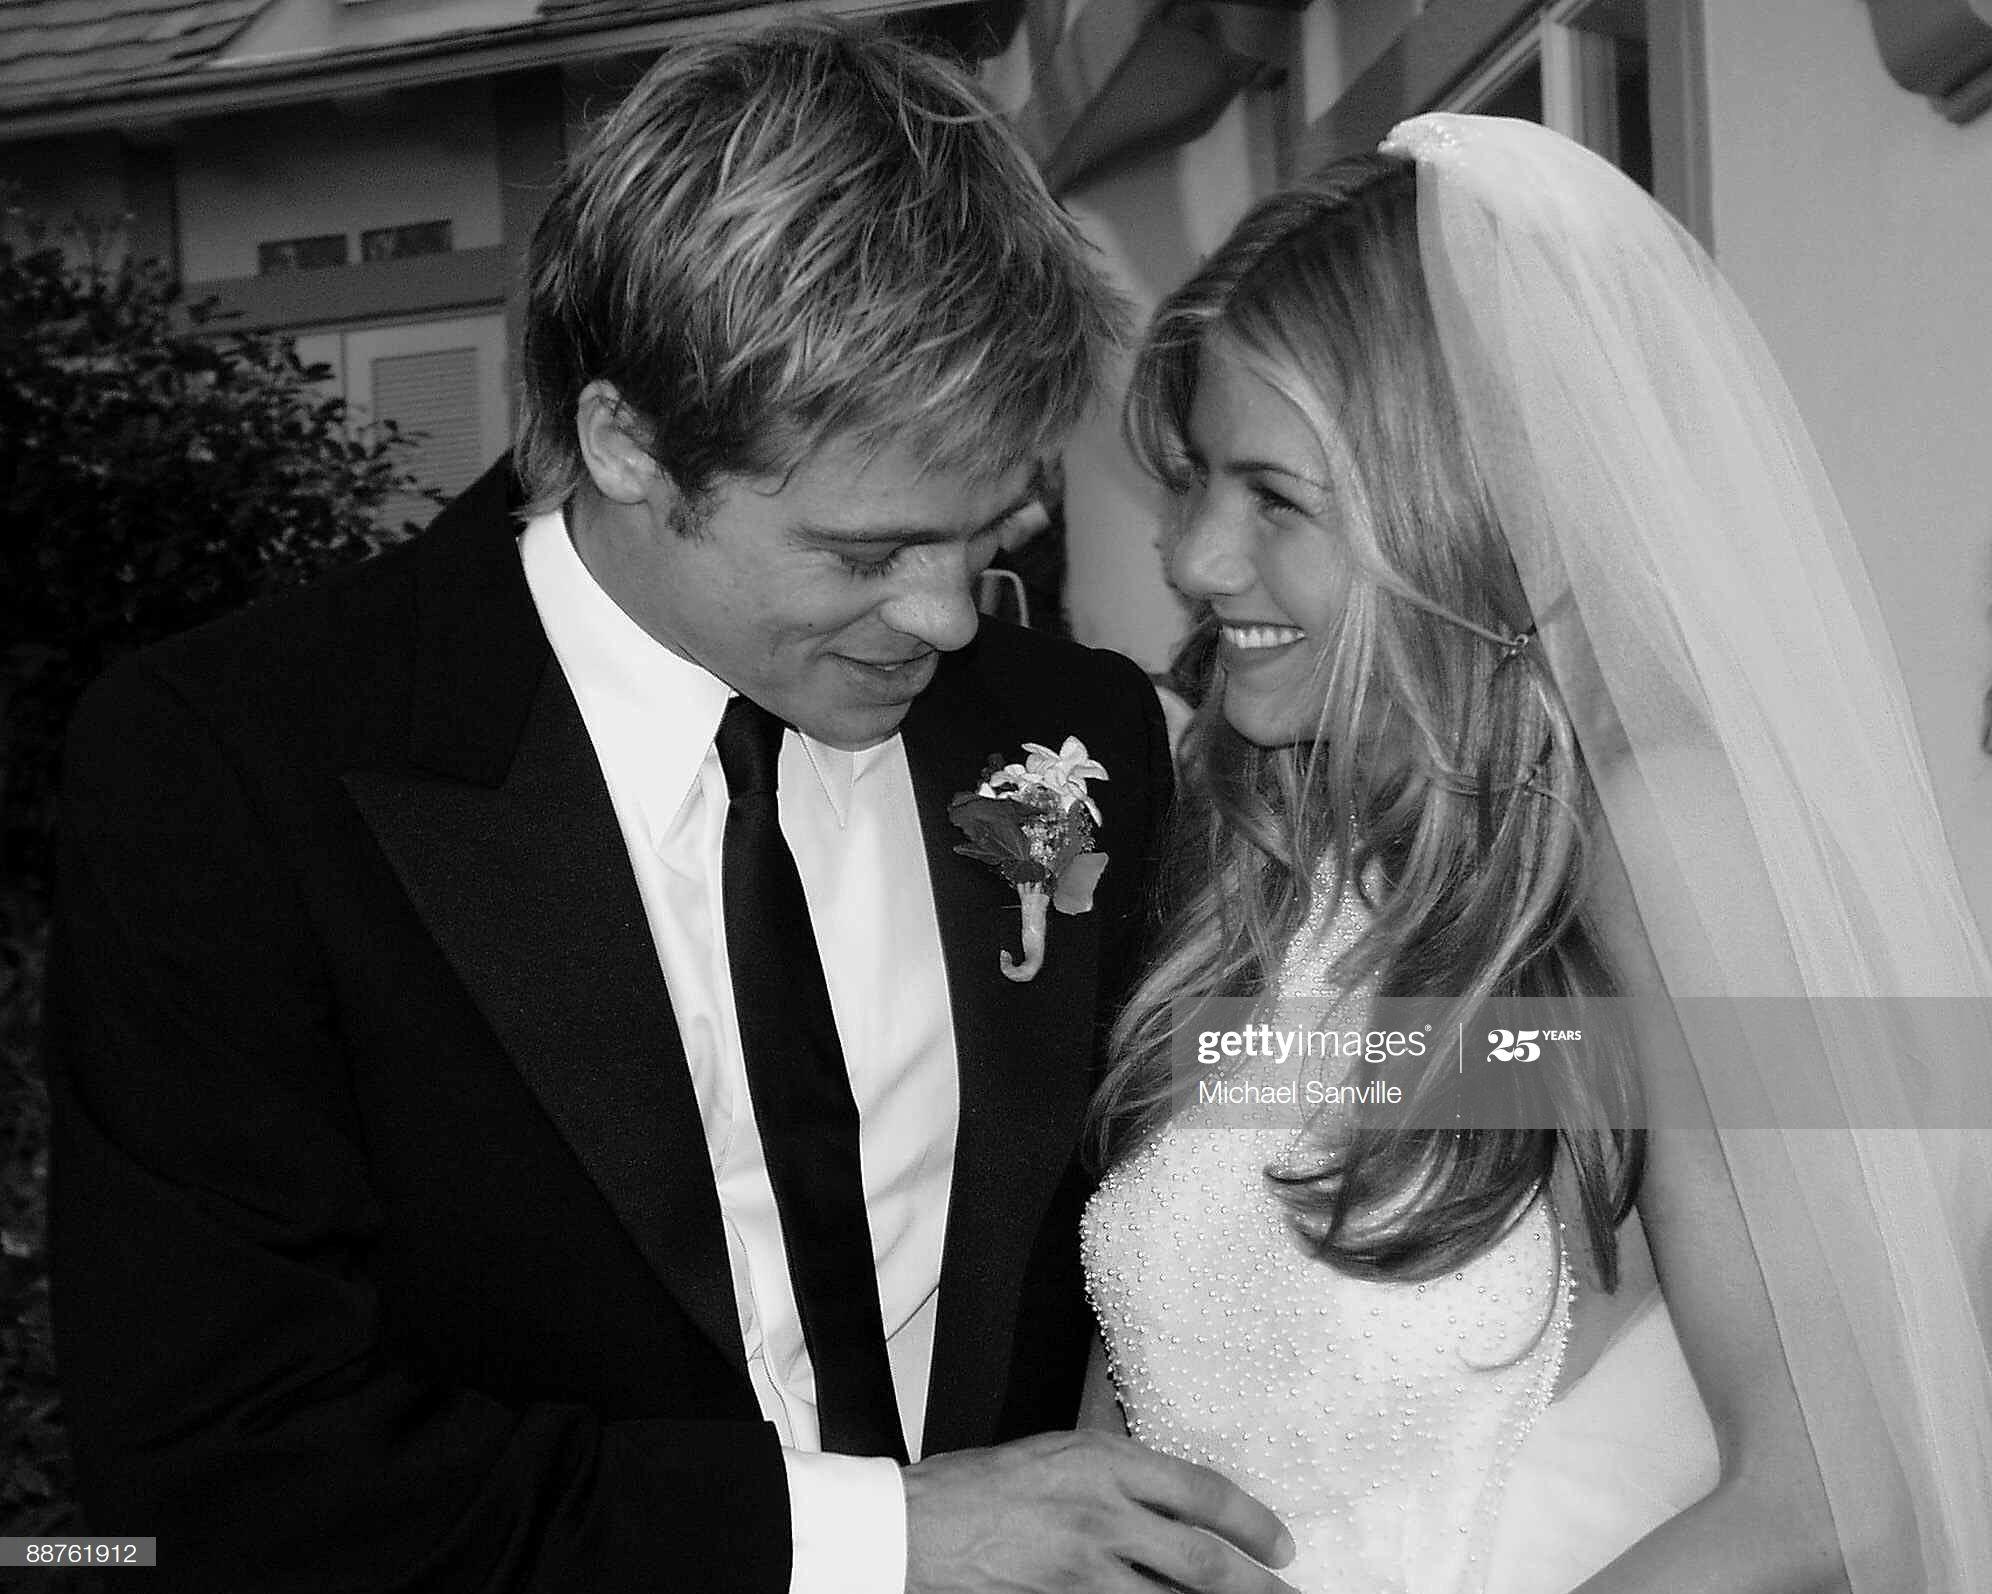 Office Newlyweds Brad Pitt And Jennifer Aniston Pose For Pictures Jennifer Aniston Wedding Jennifer Aniston Wedding Dress Brad Pitt And Jennifer